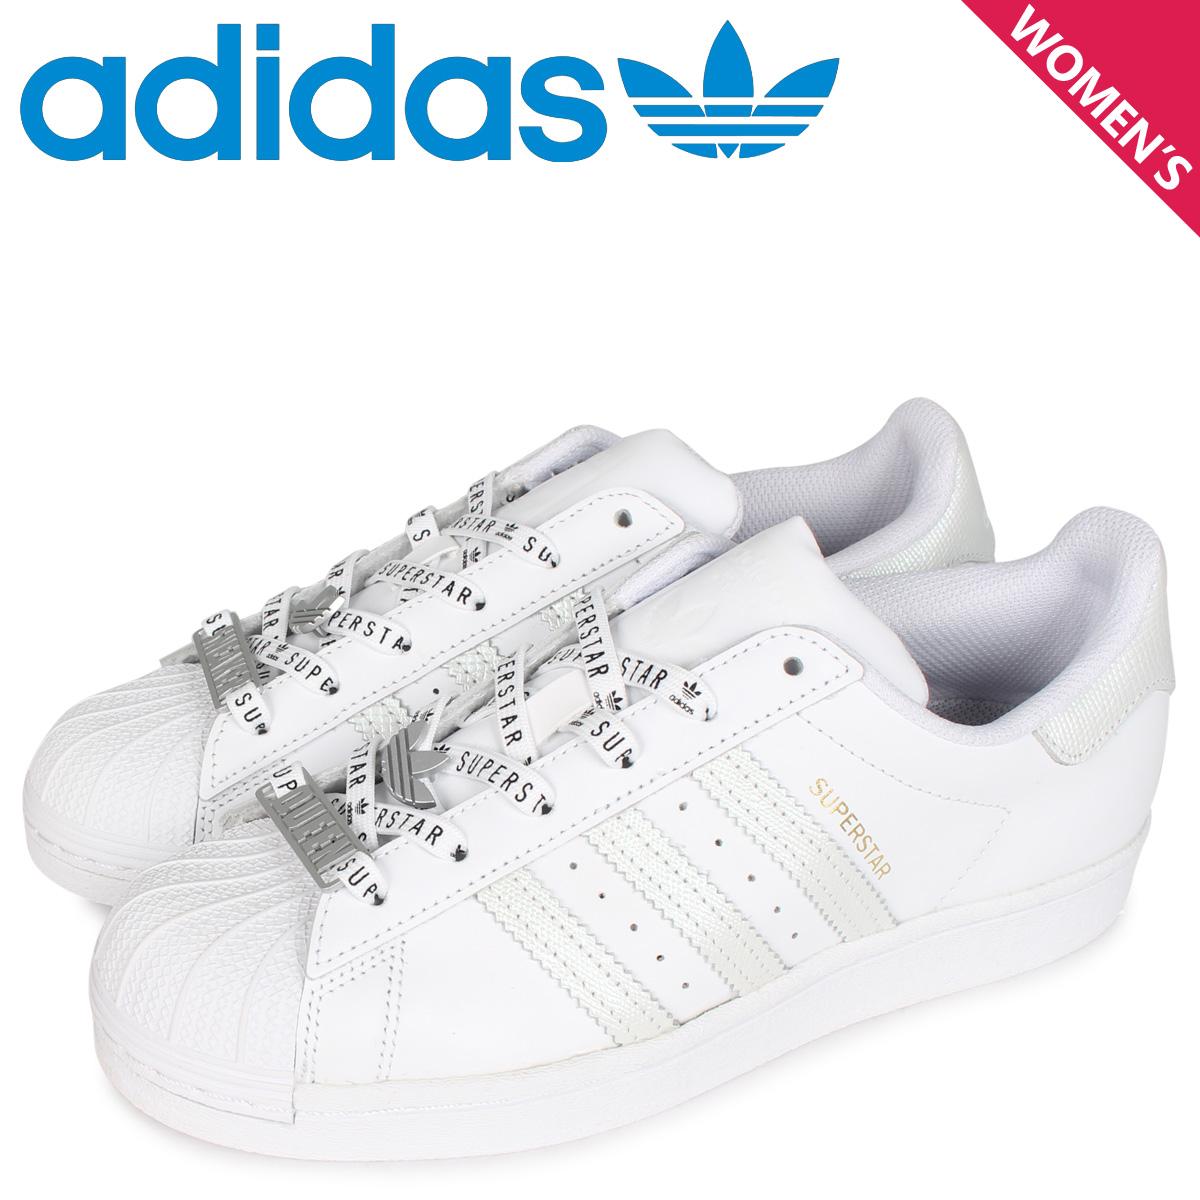 adidas Originals アディダス オリジナルス スーパースター スニーカー レディース SUPERSTAR W ホワイト 白 FV3392 [5/29 新入荷]